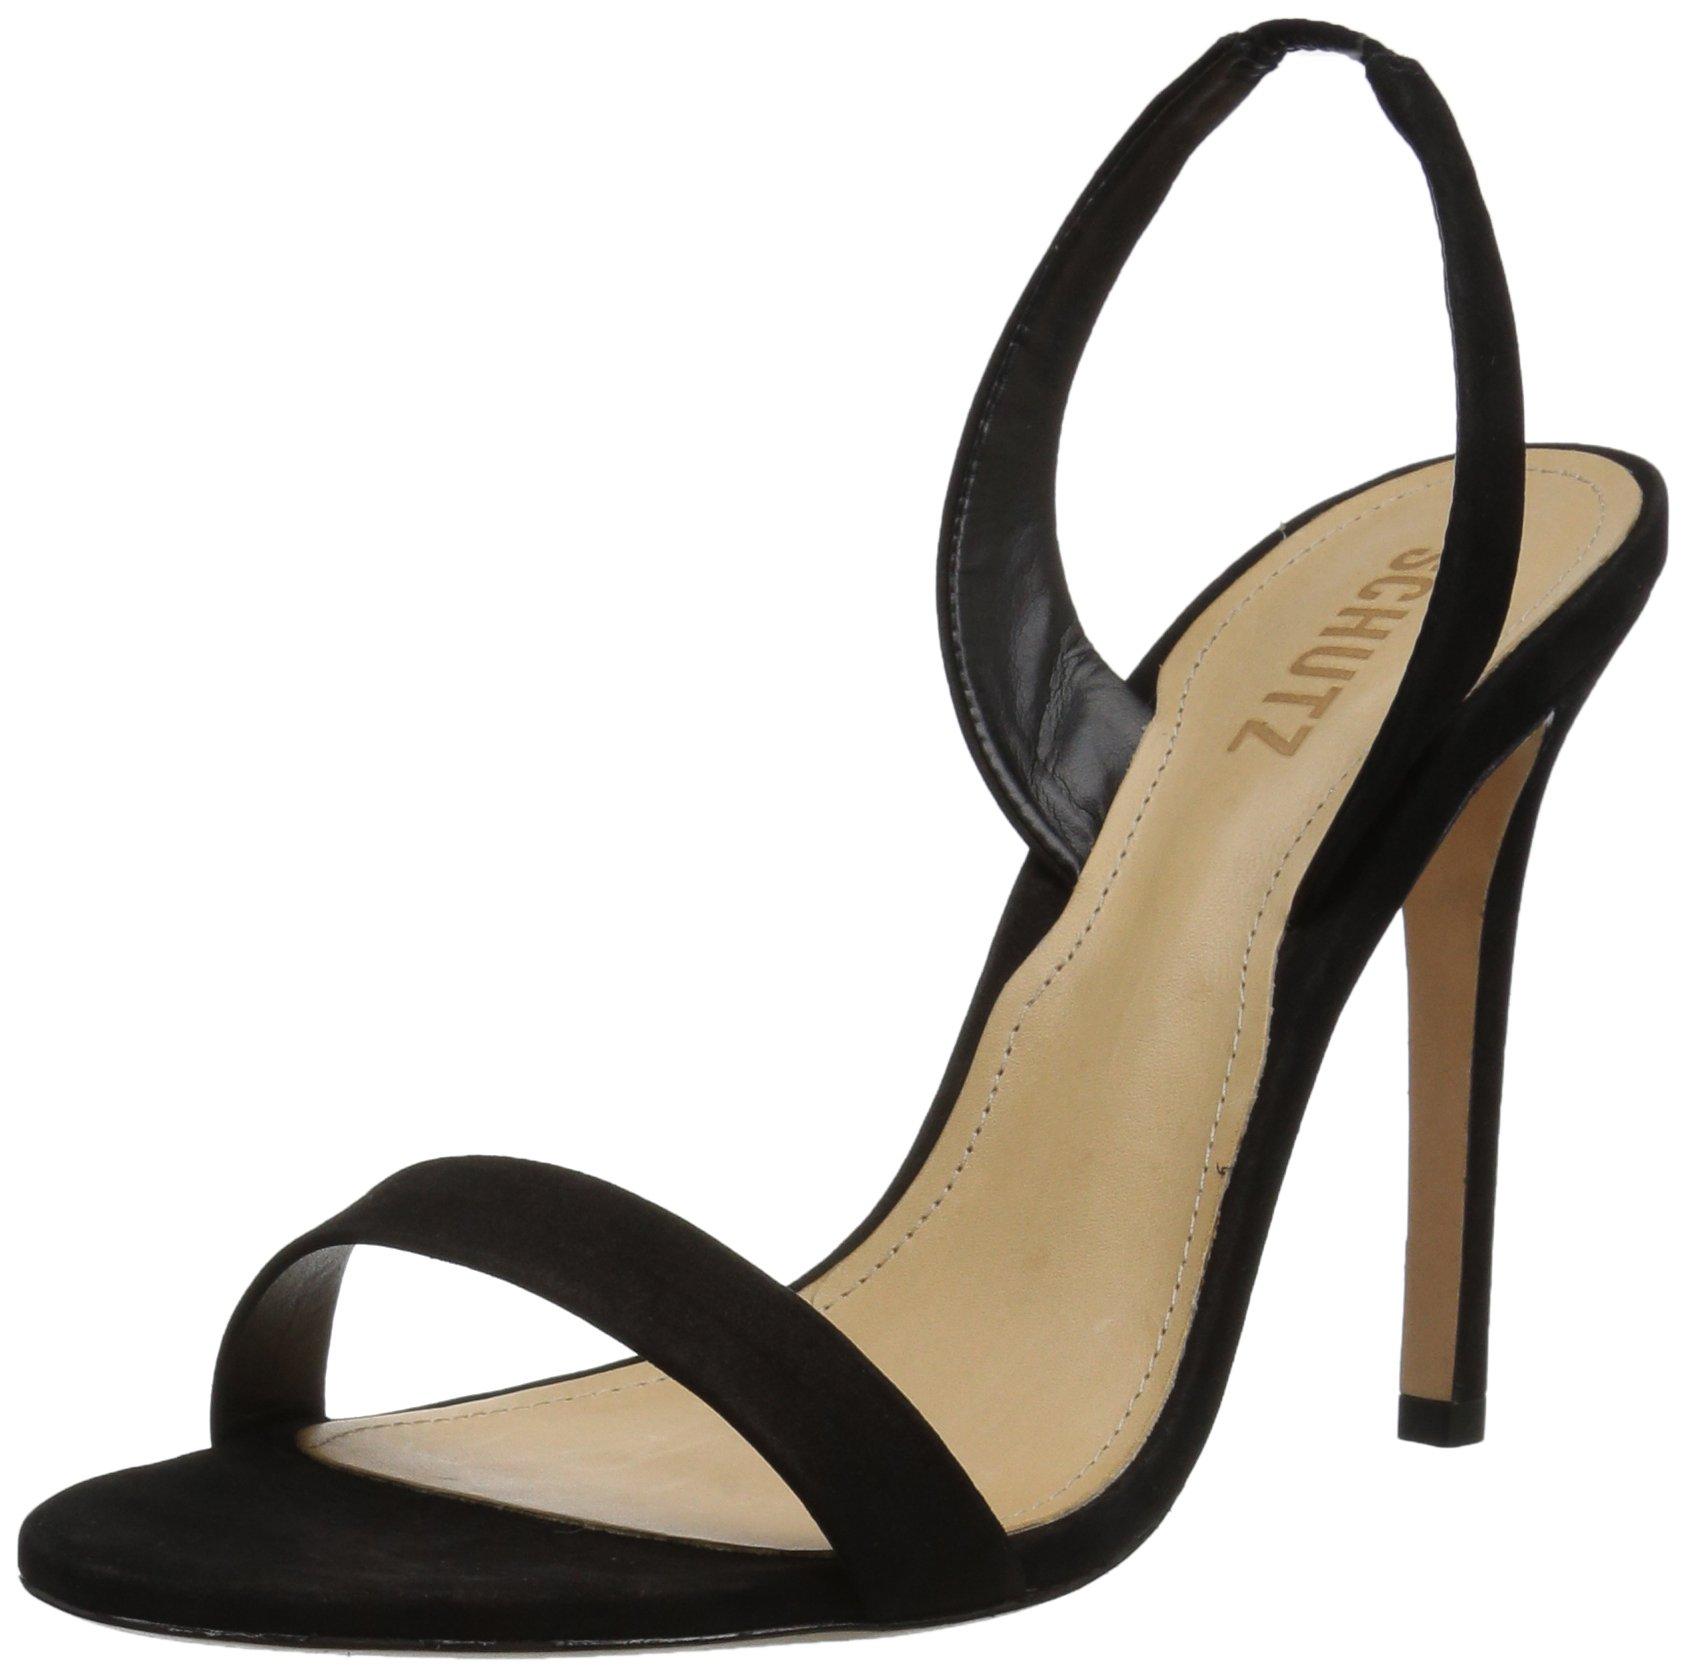 Schutz Women's Luriane Heeled Sandal, Black, 7 M US